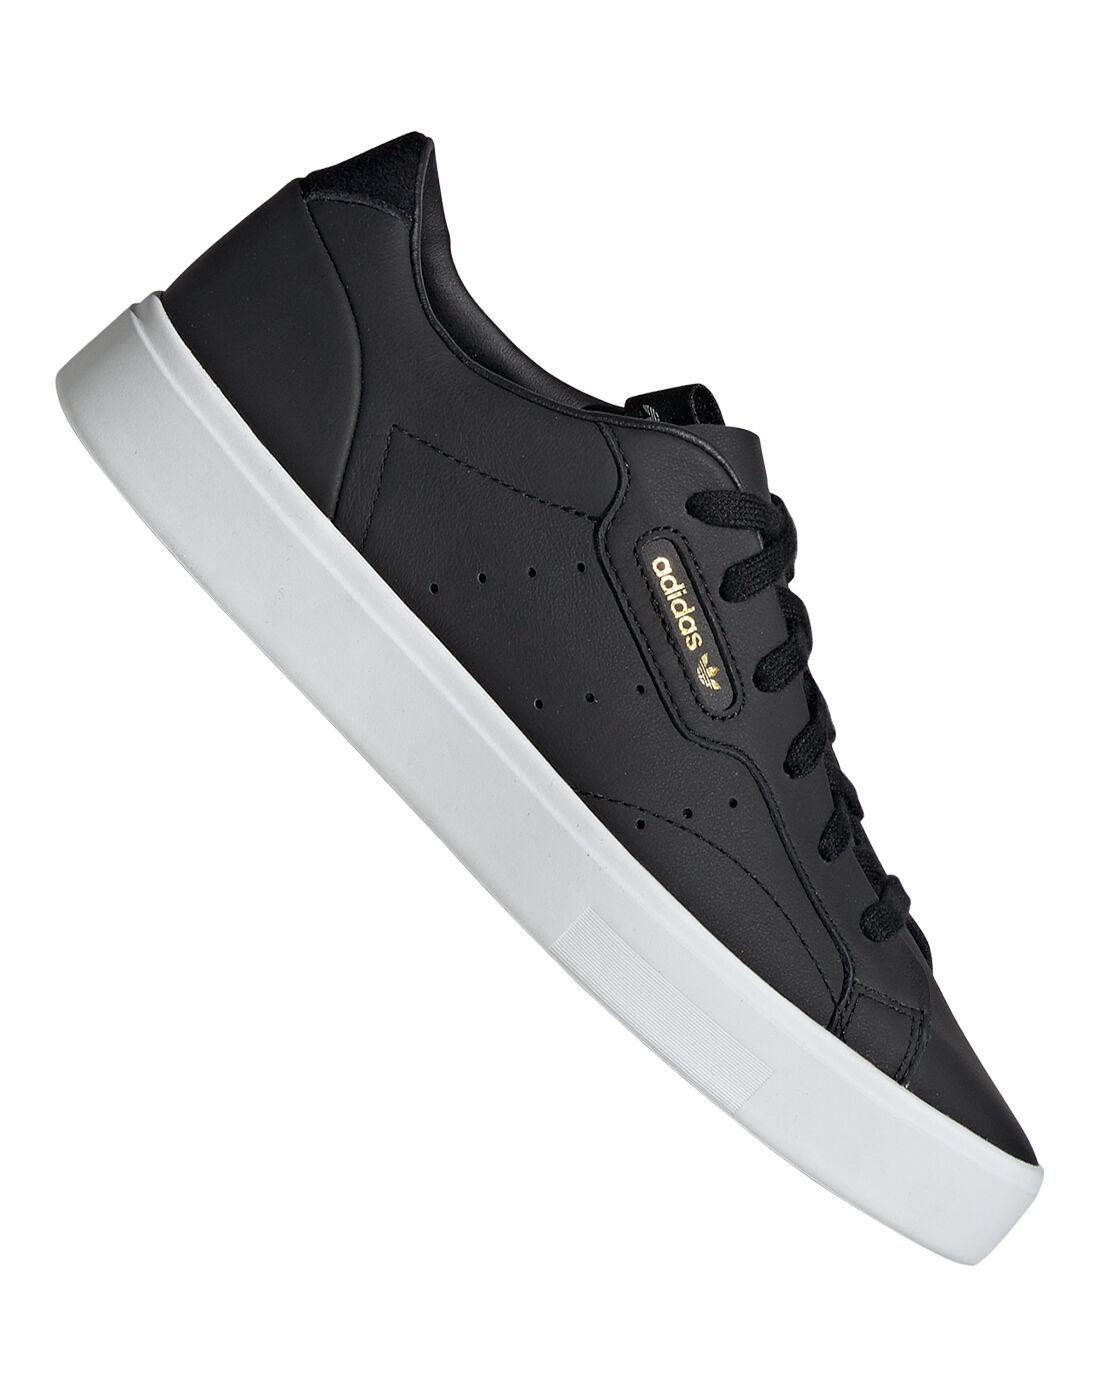 Black adidas Originals Sleek Trainers